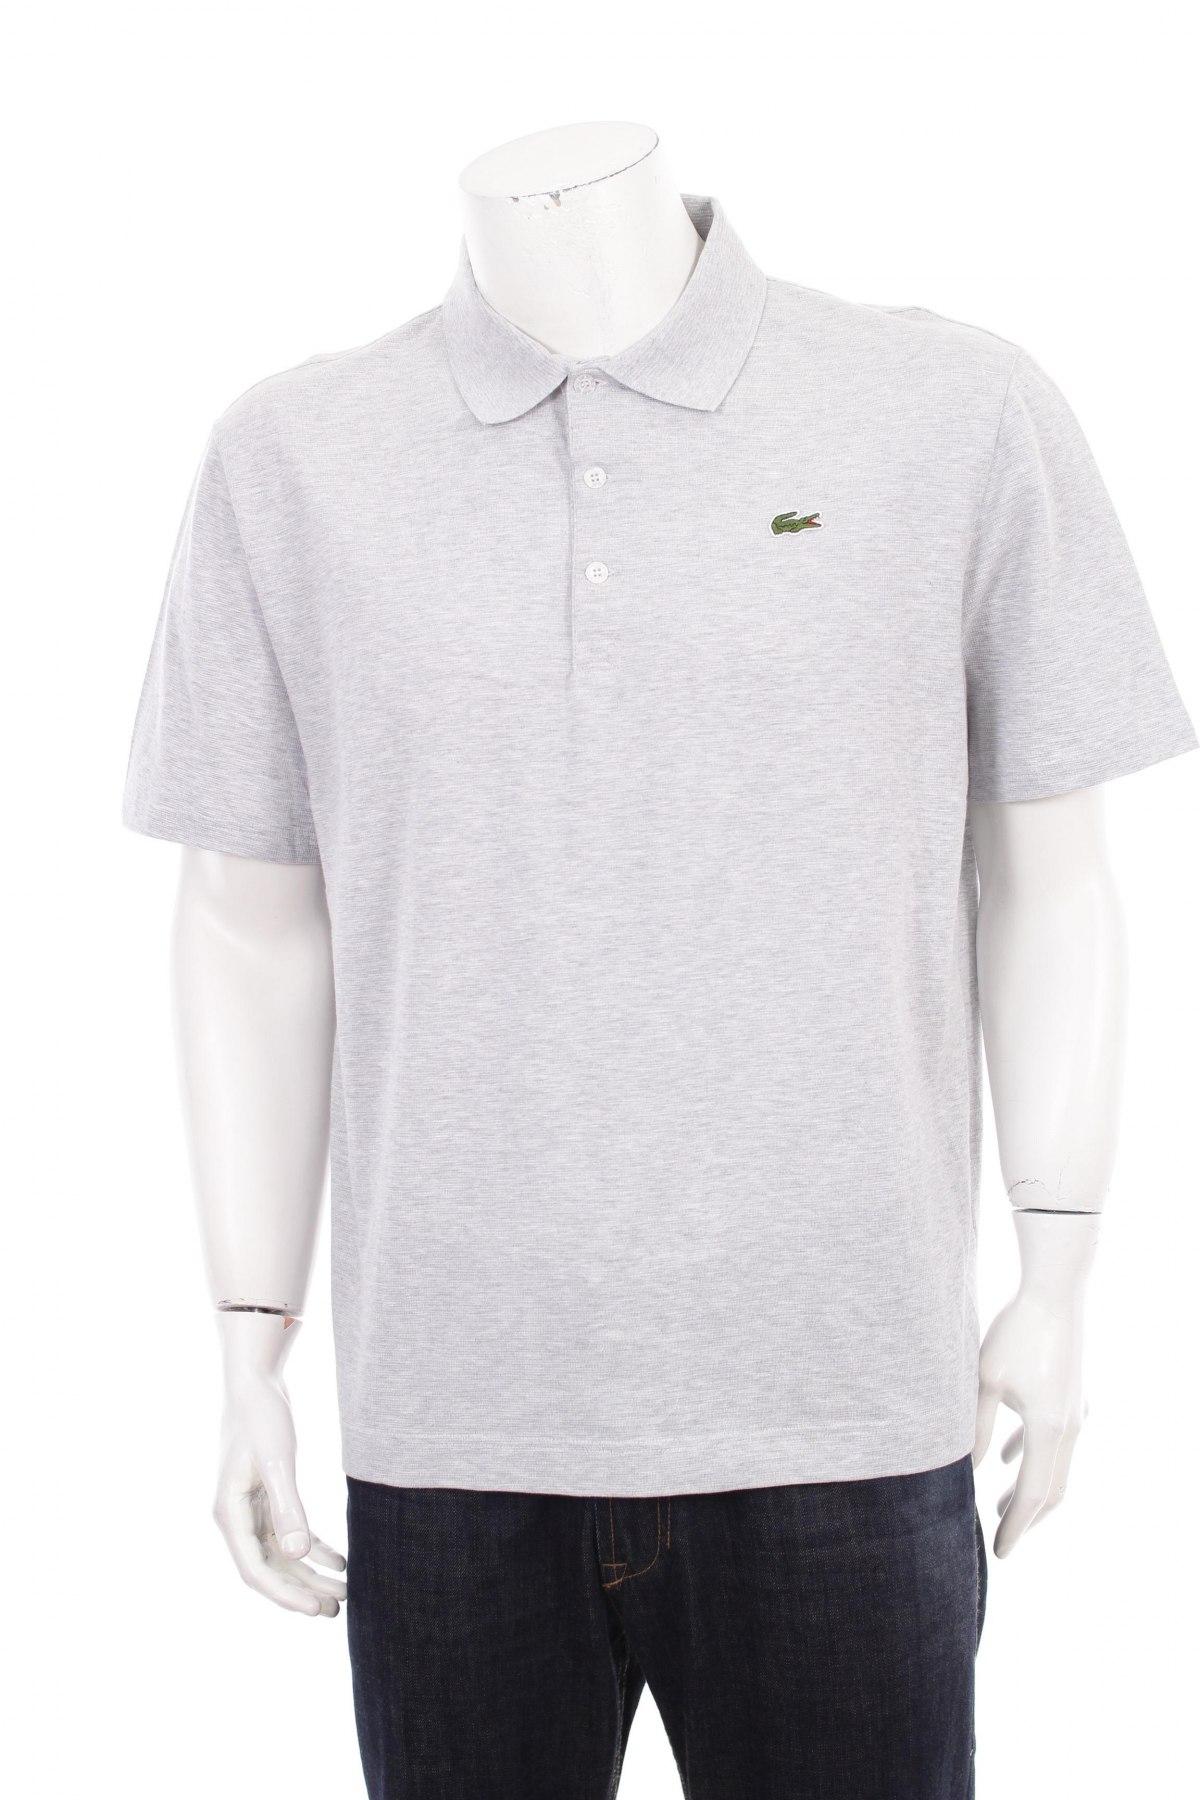 a6128a63cc89 Ανδρικό t-shirt Lacoste - σε συμφέρουσα τιμή στο Remix -  100109008